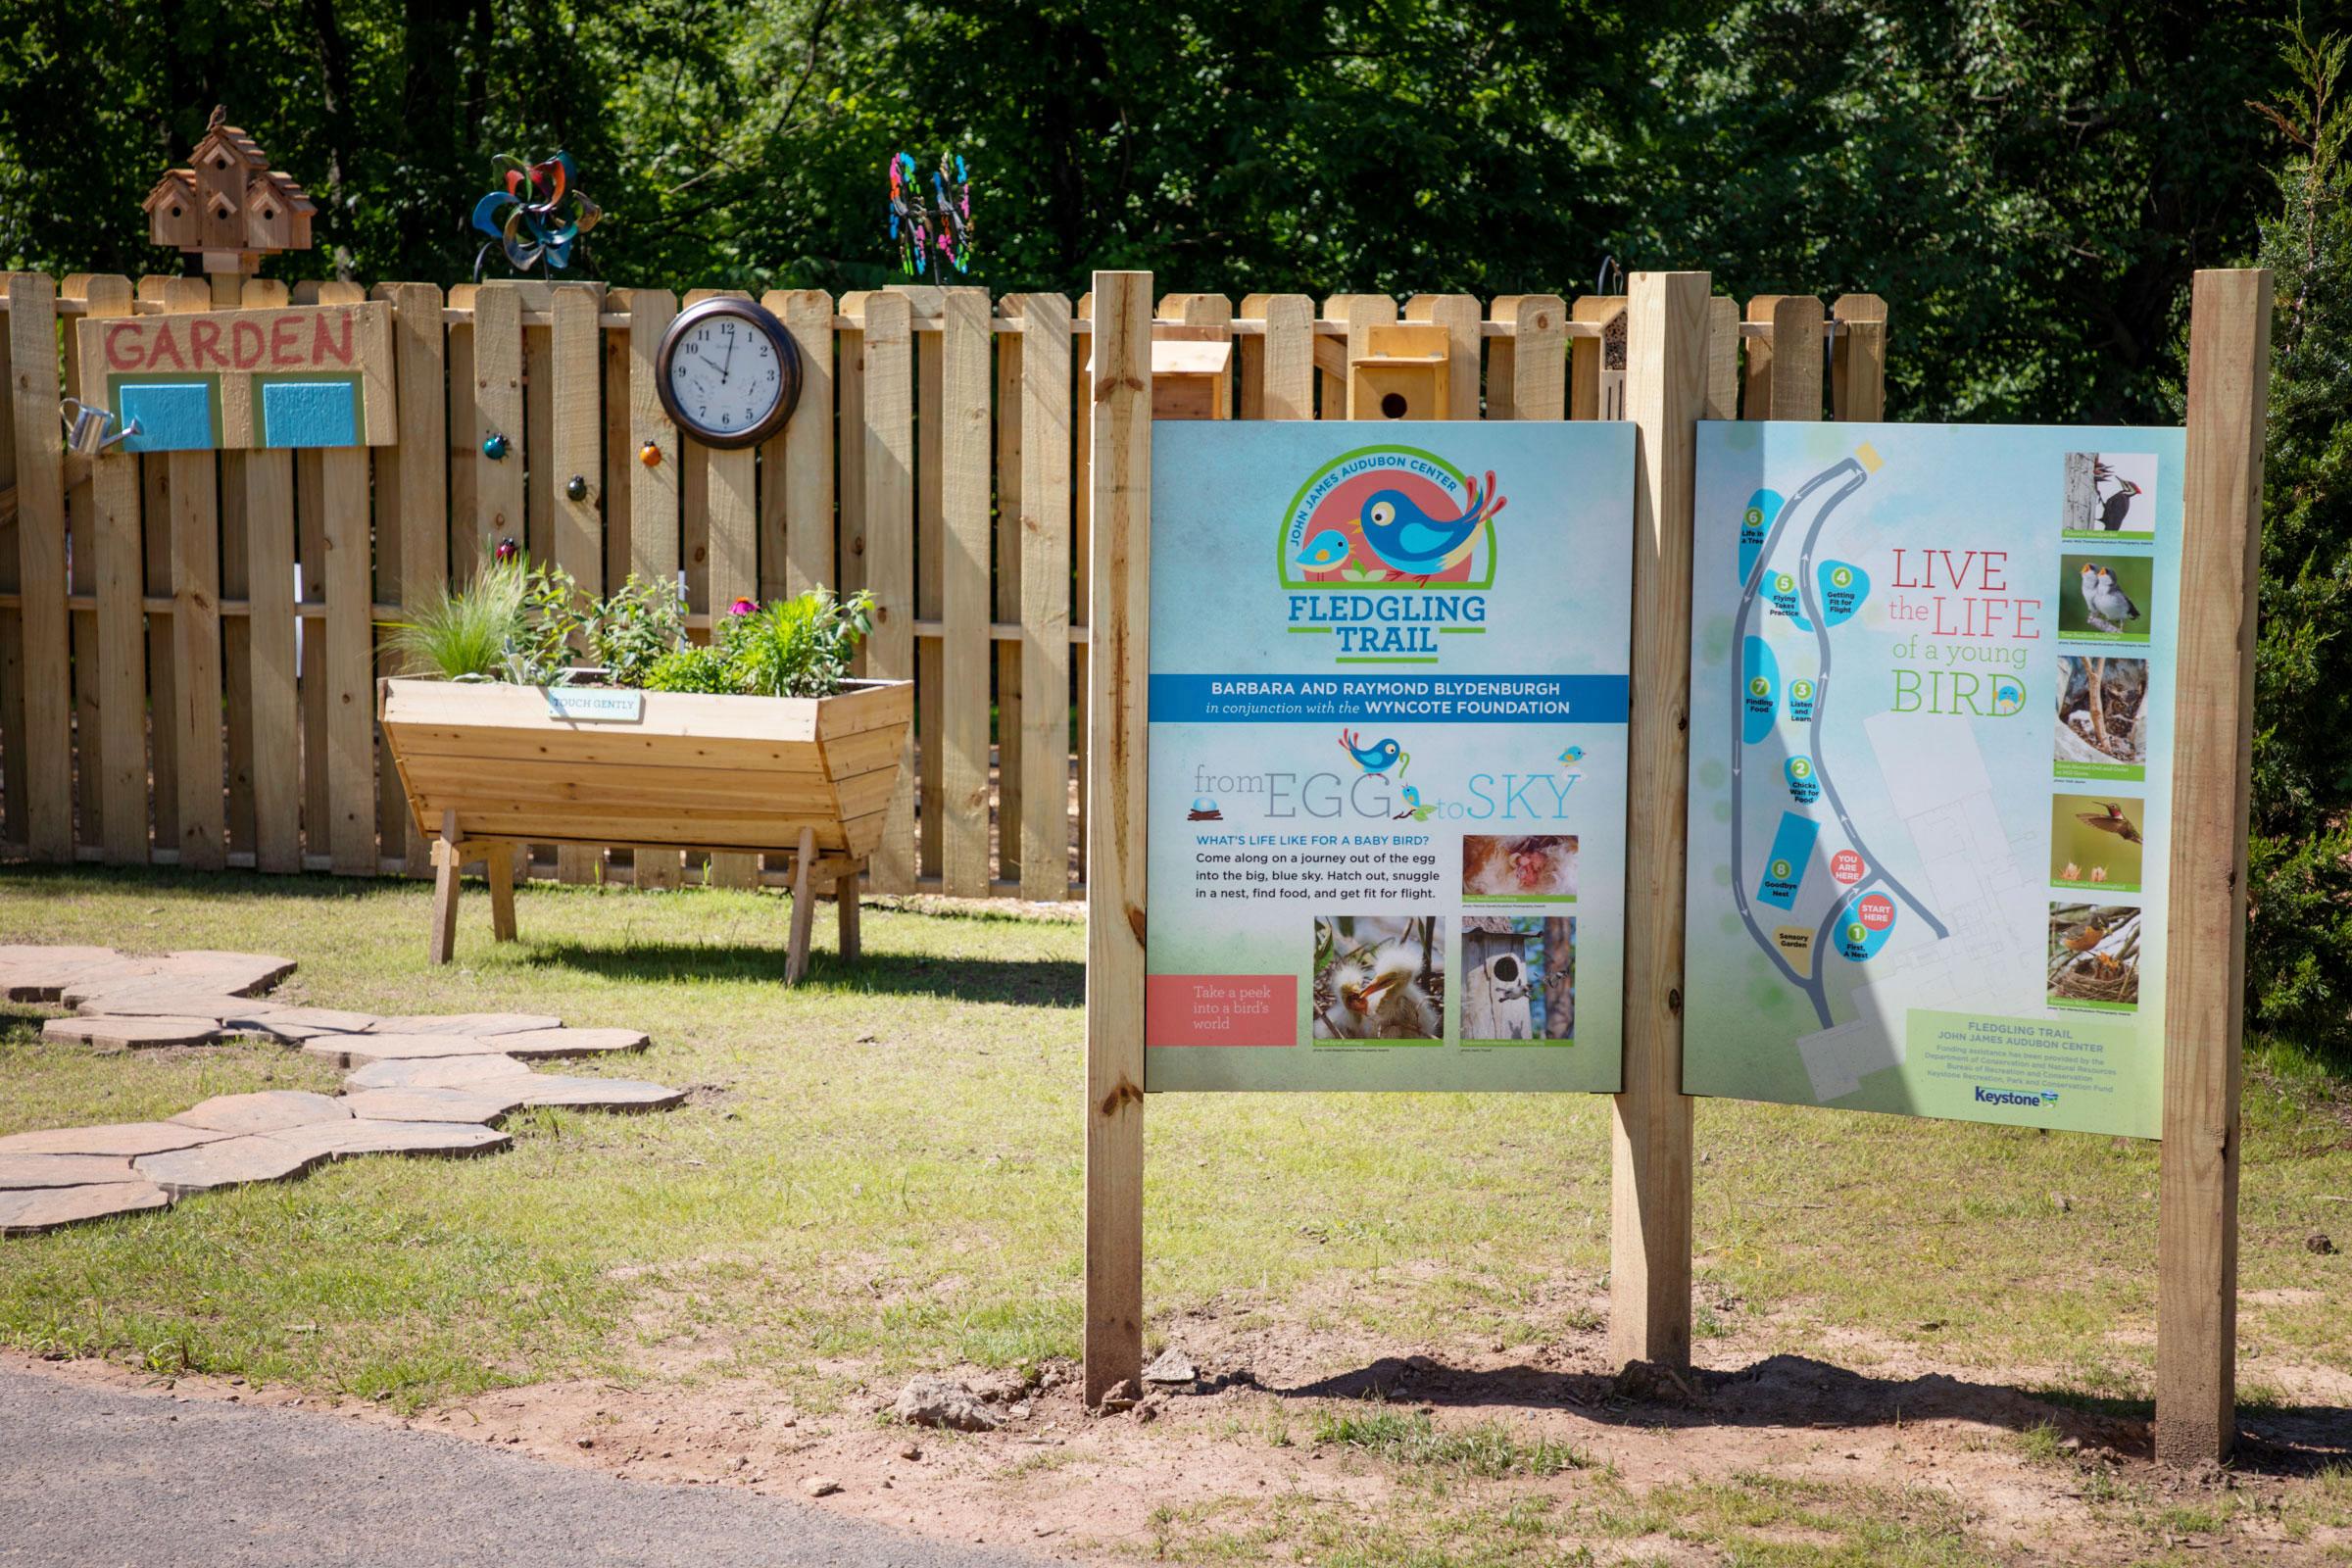 The main entrance to the Fledgling Trail and interactive children's garden at the John James Audubon Center at Mill Grove on Tuesday, June 4, 2019 in Audubon, Pennsylvania. Photo: Luke Franke/Audubon